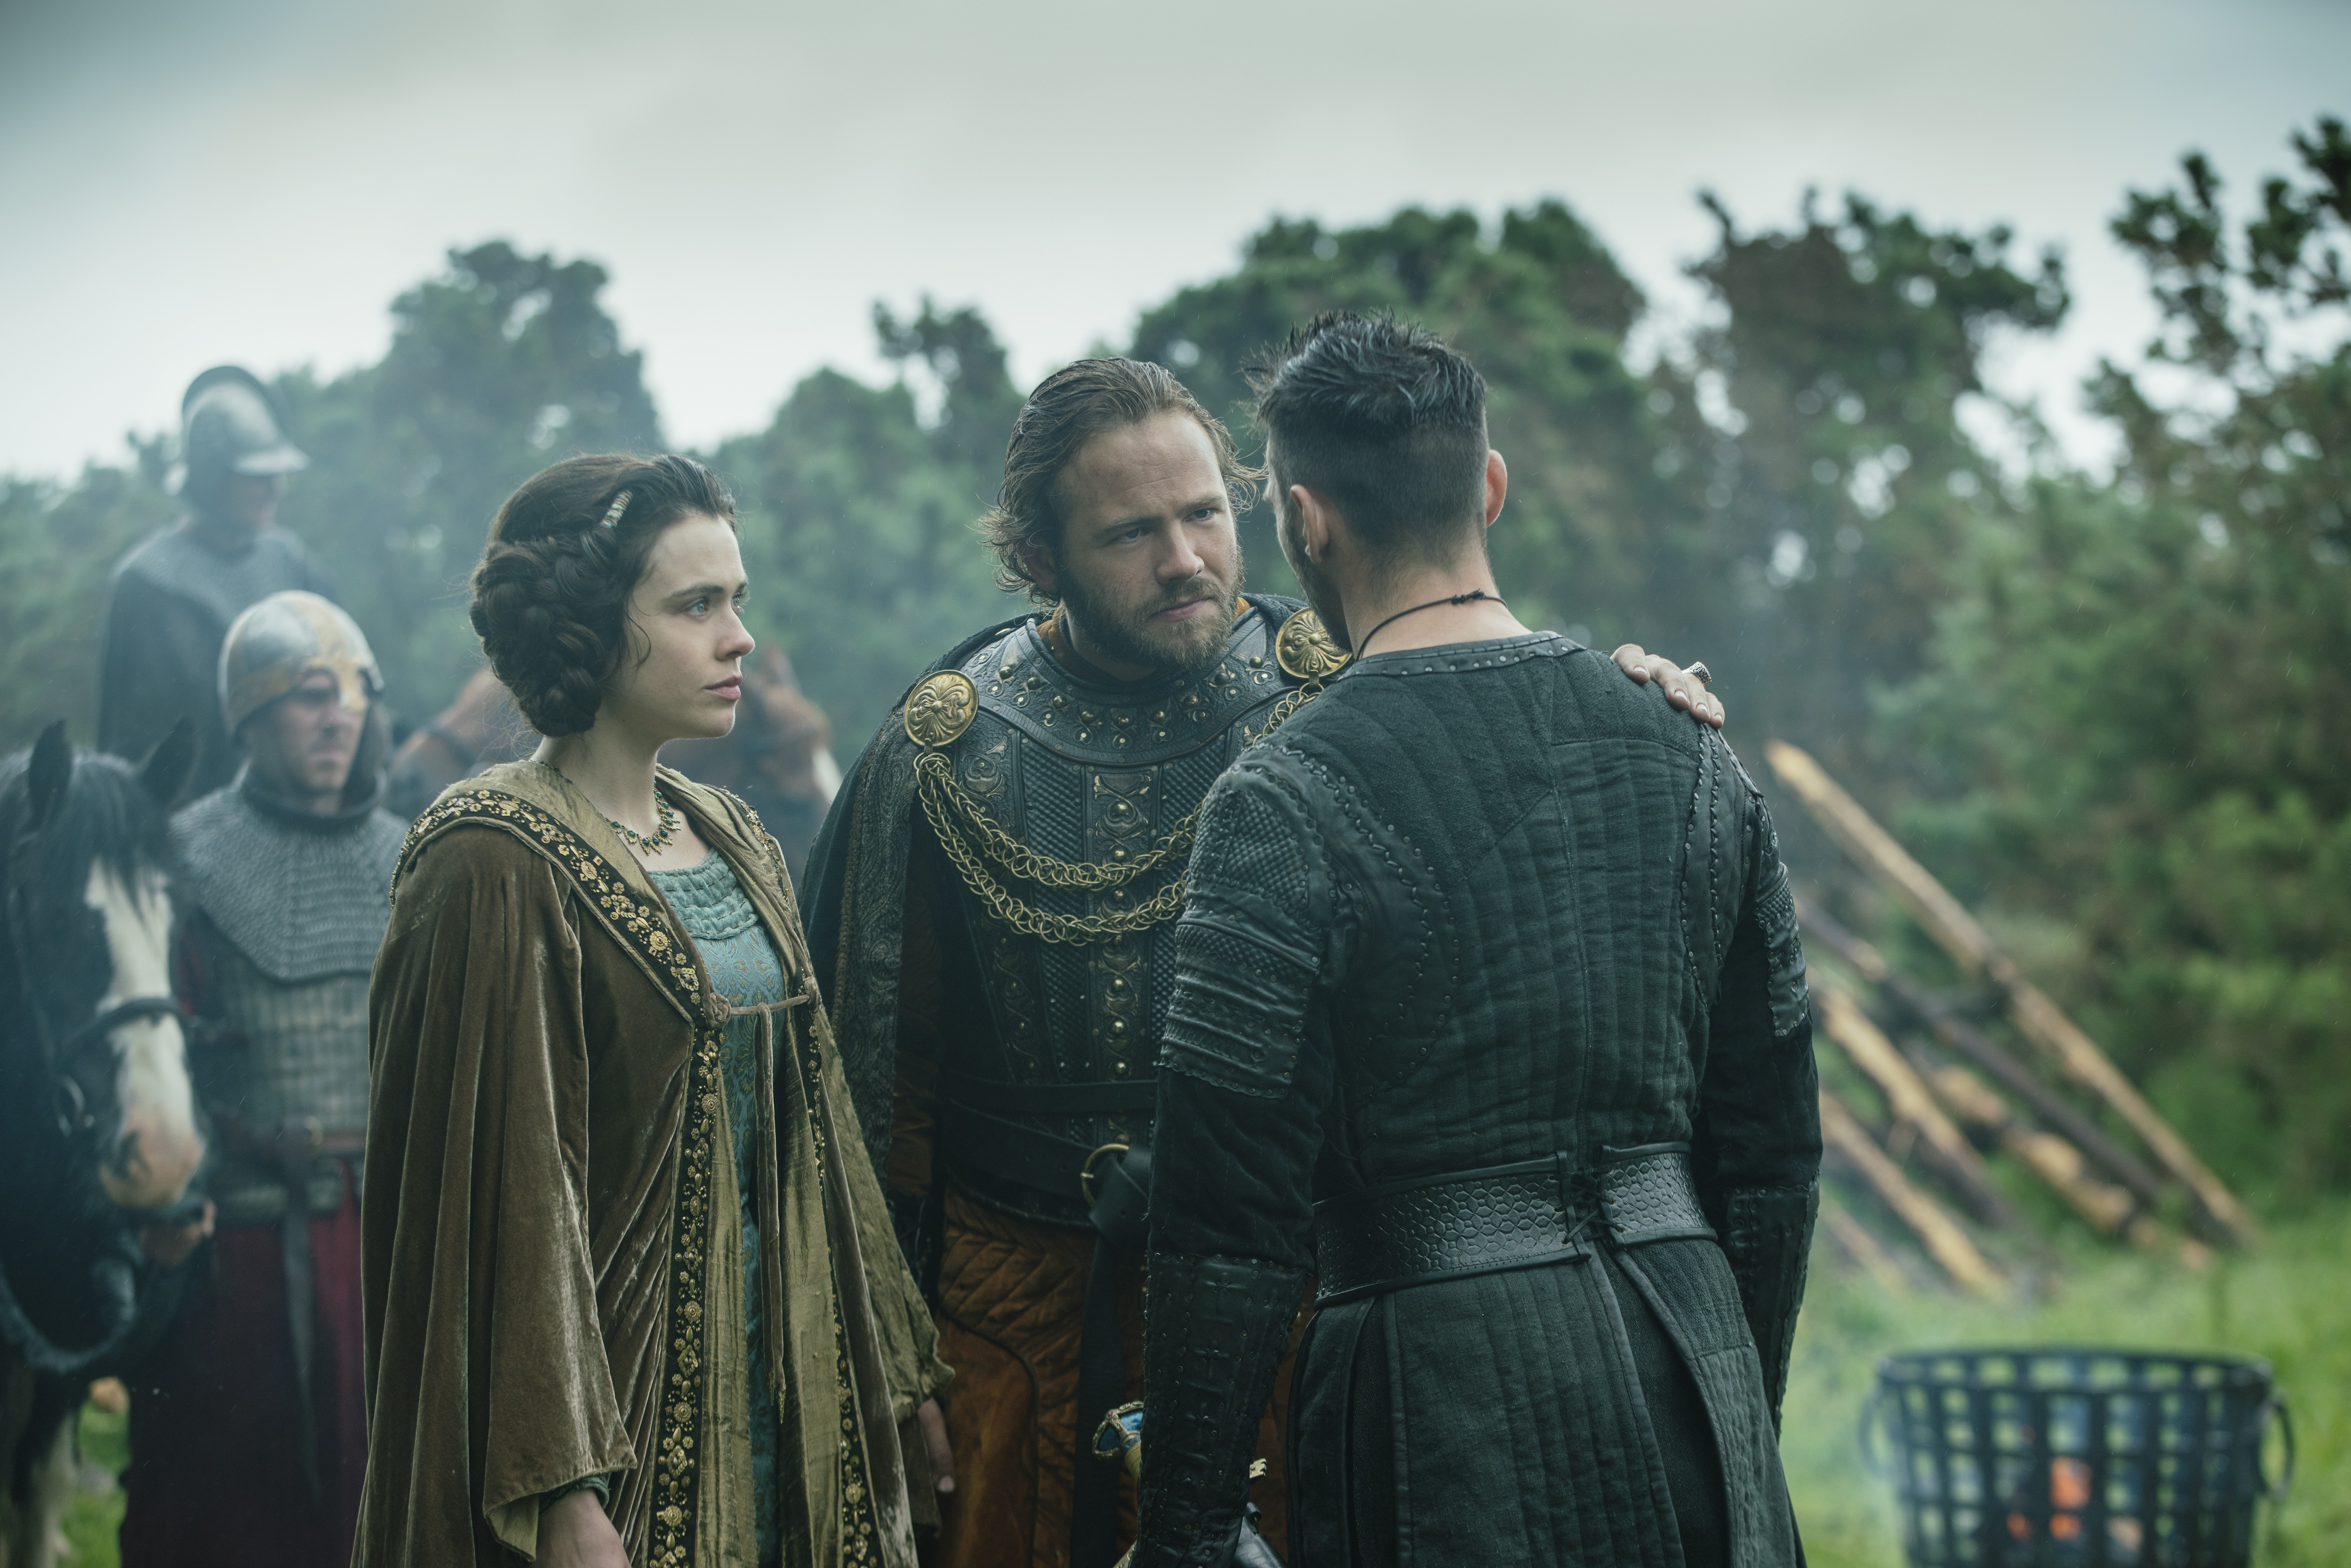 Vikingos Serie De Television Imagenes Vikings Season 5 First Look